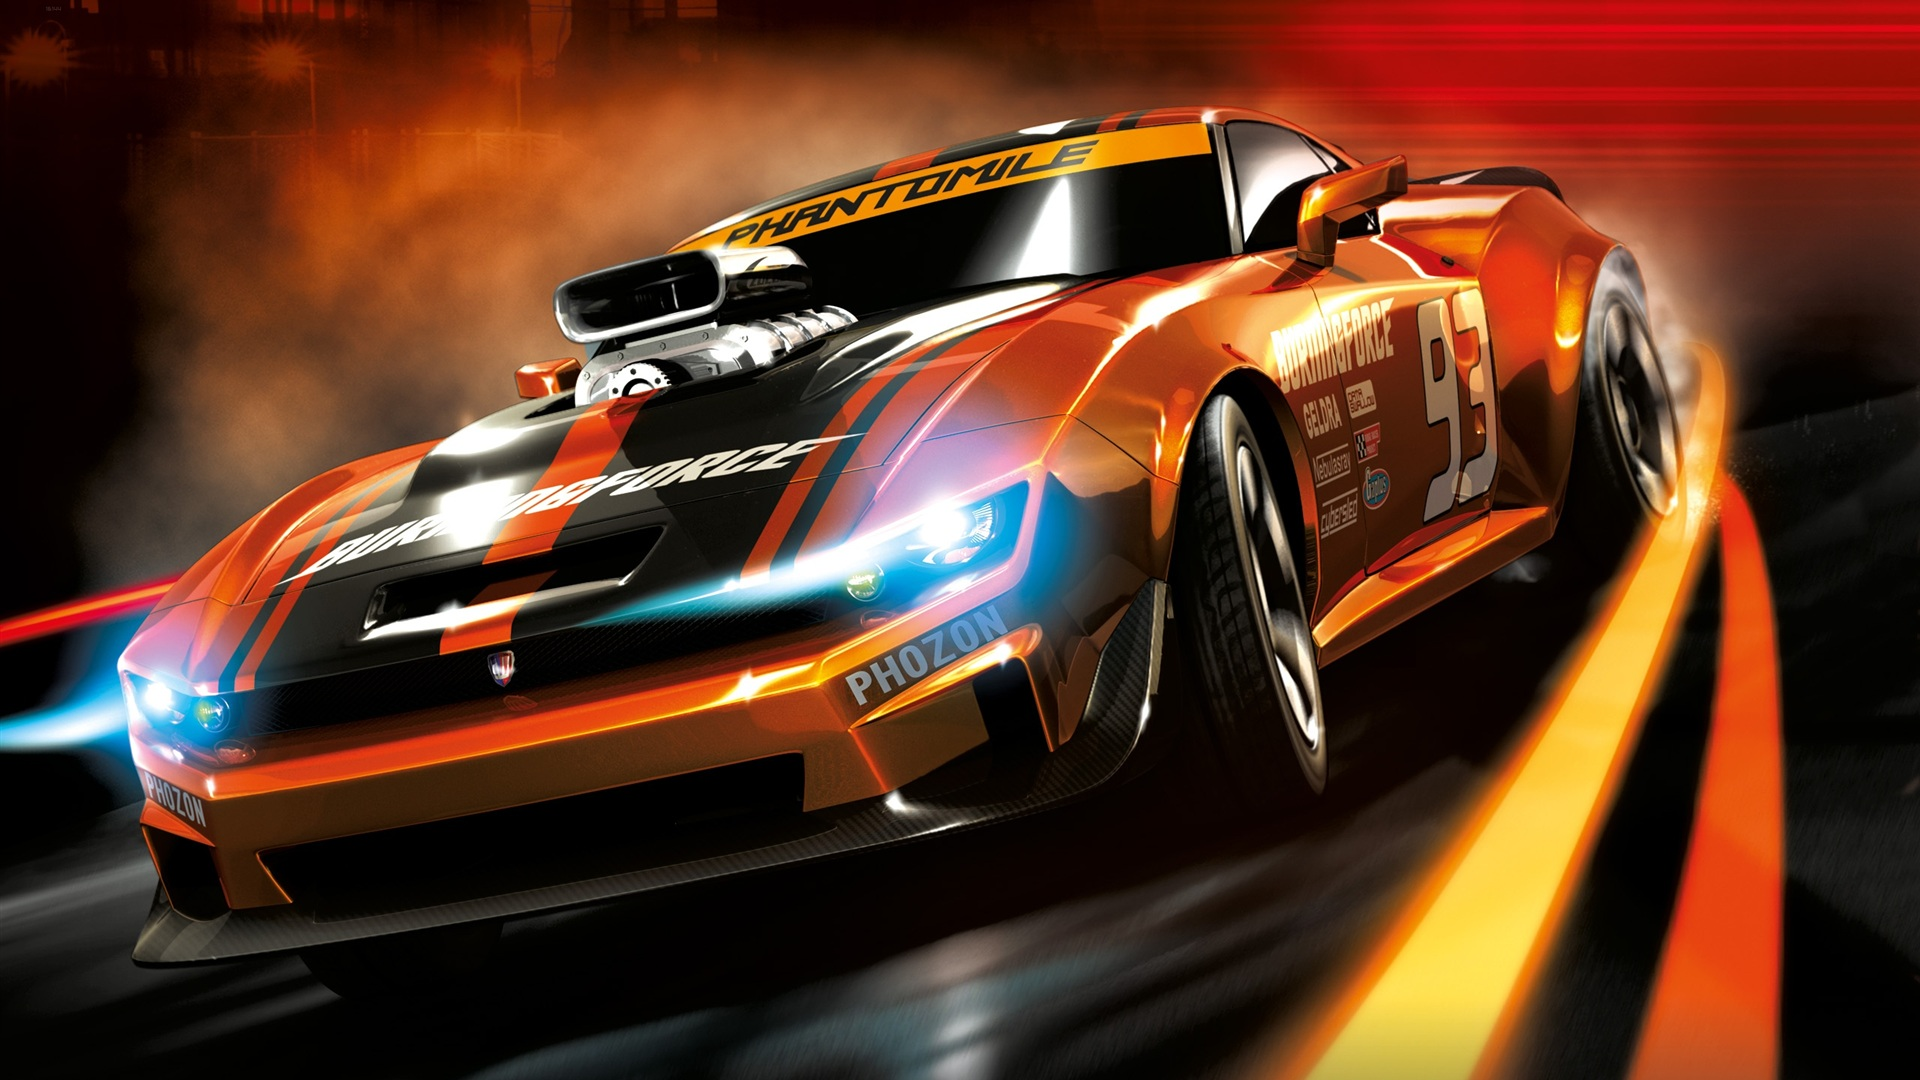 5k ferrari f8 spider 2020. Racing Cars Live Wallpapers Cool Wallpapers Cars 1600x900 Wallpaper Teahub Io